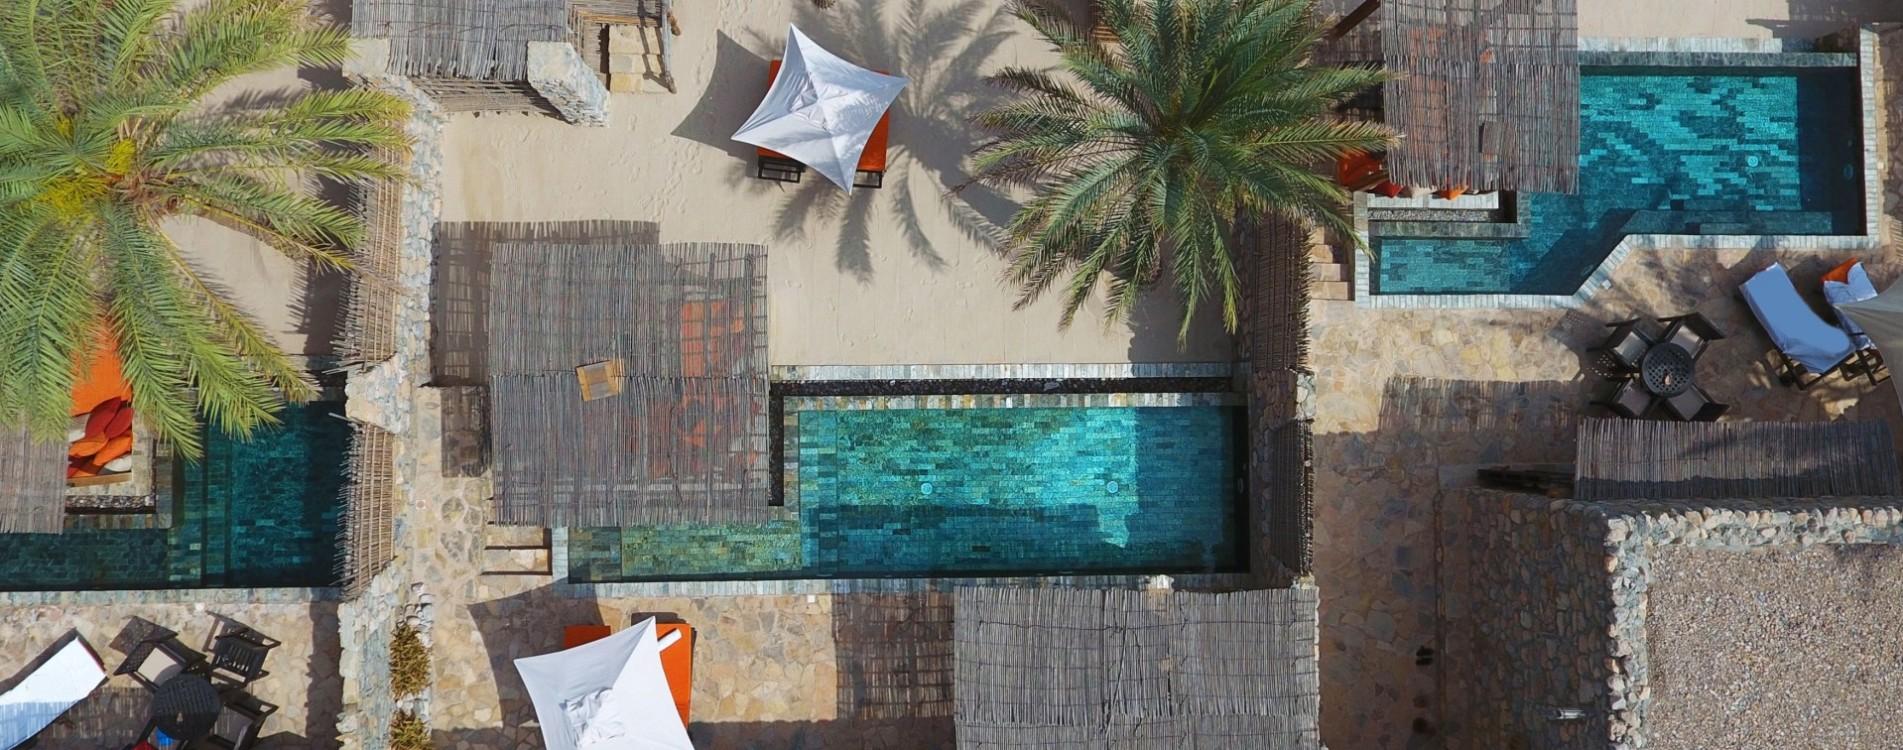 Six-Senses-Zighy-Bay-Pool-Villa-Suite-Beach-Front-Luftbildaufnahme-Oman.jpg